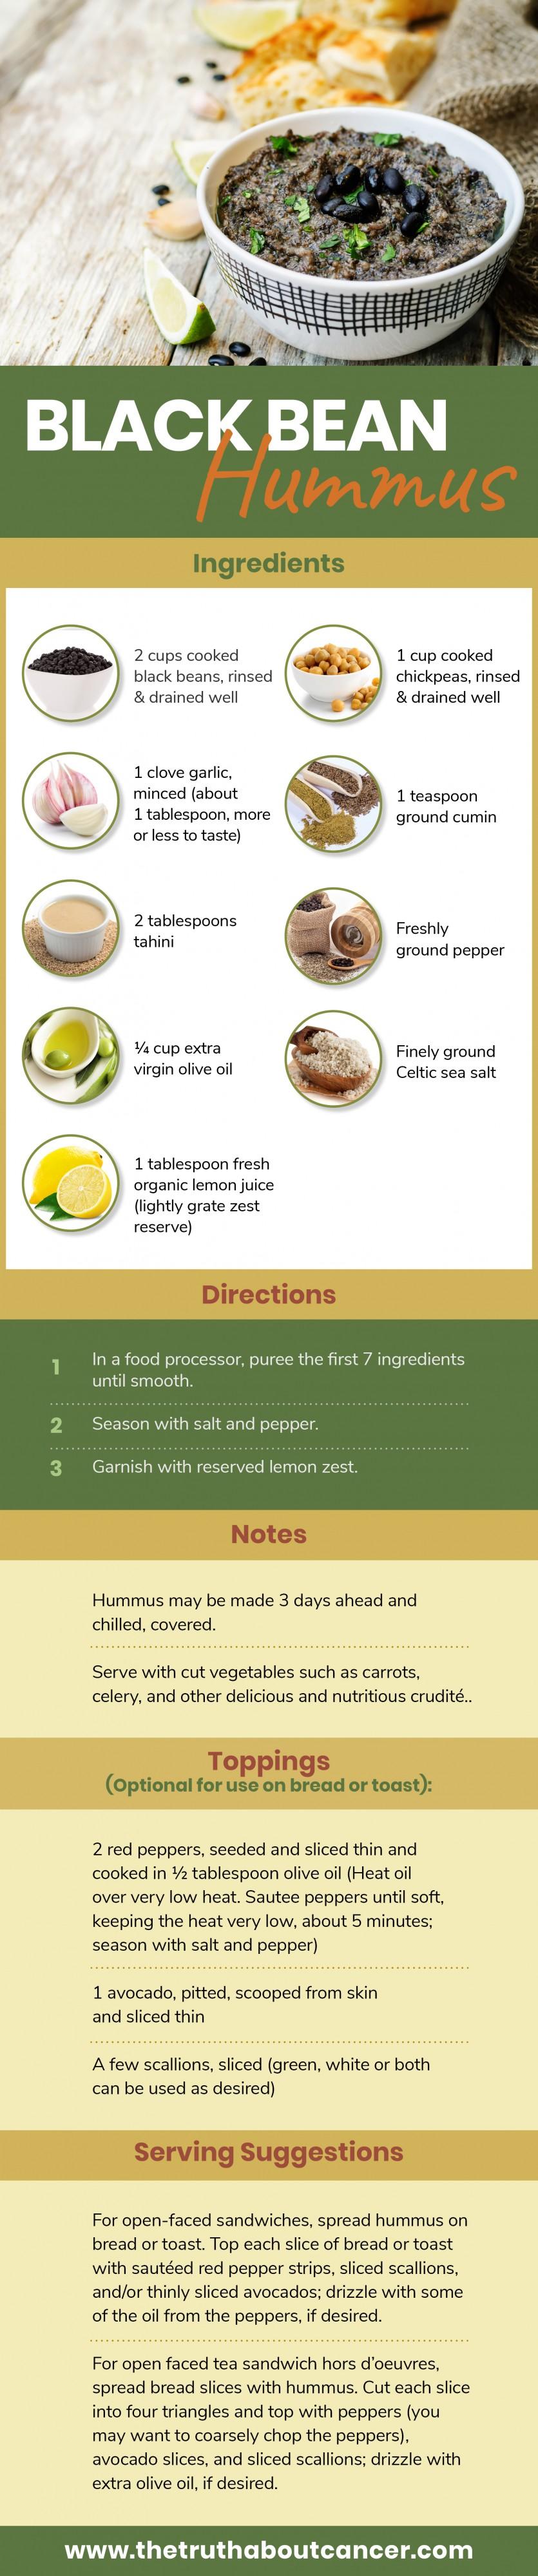 black bean hummus recipe infographic